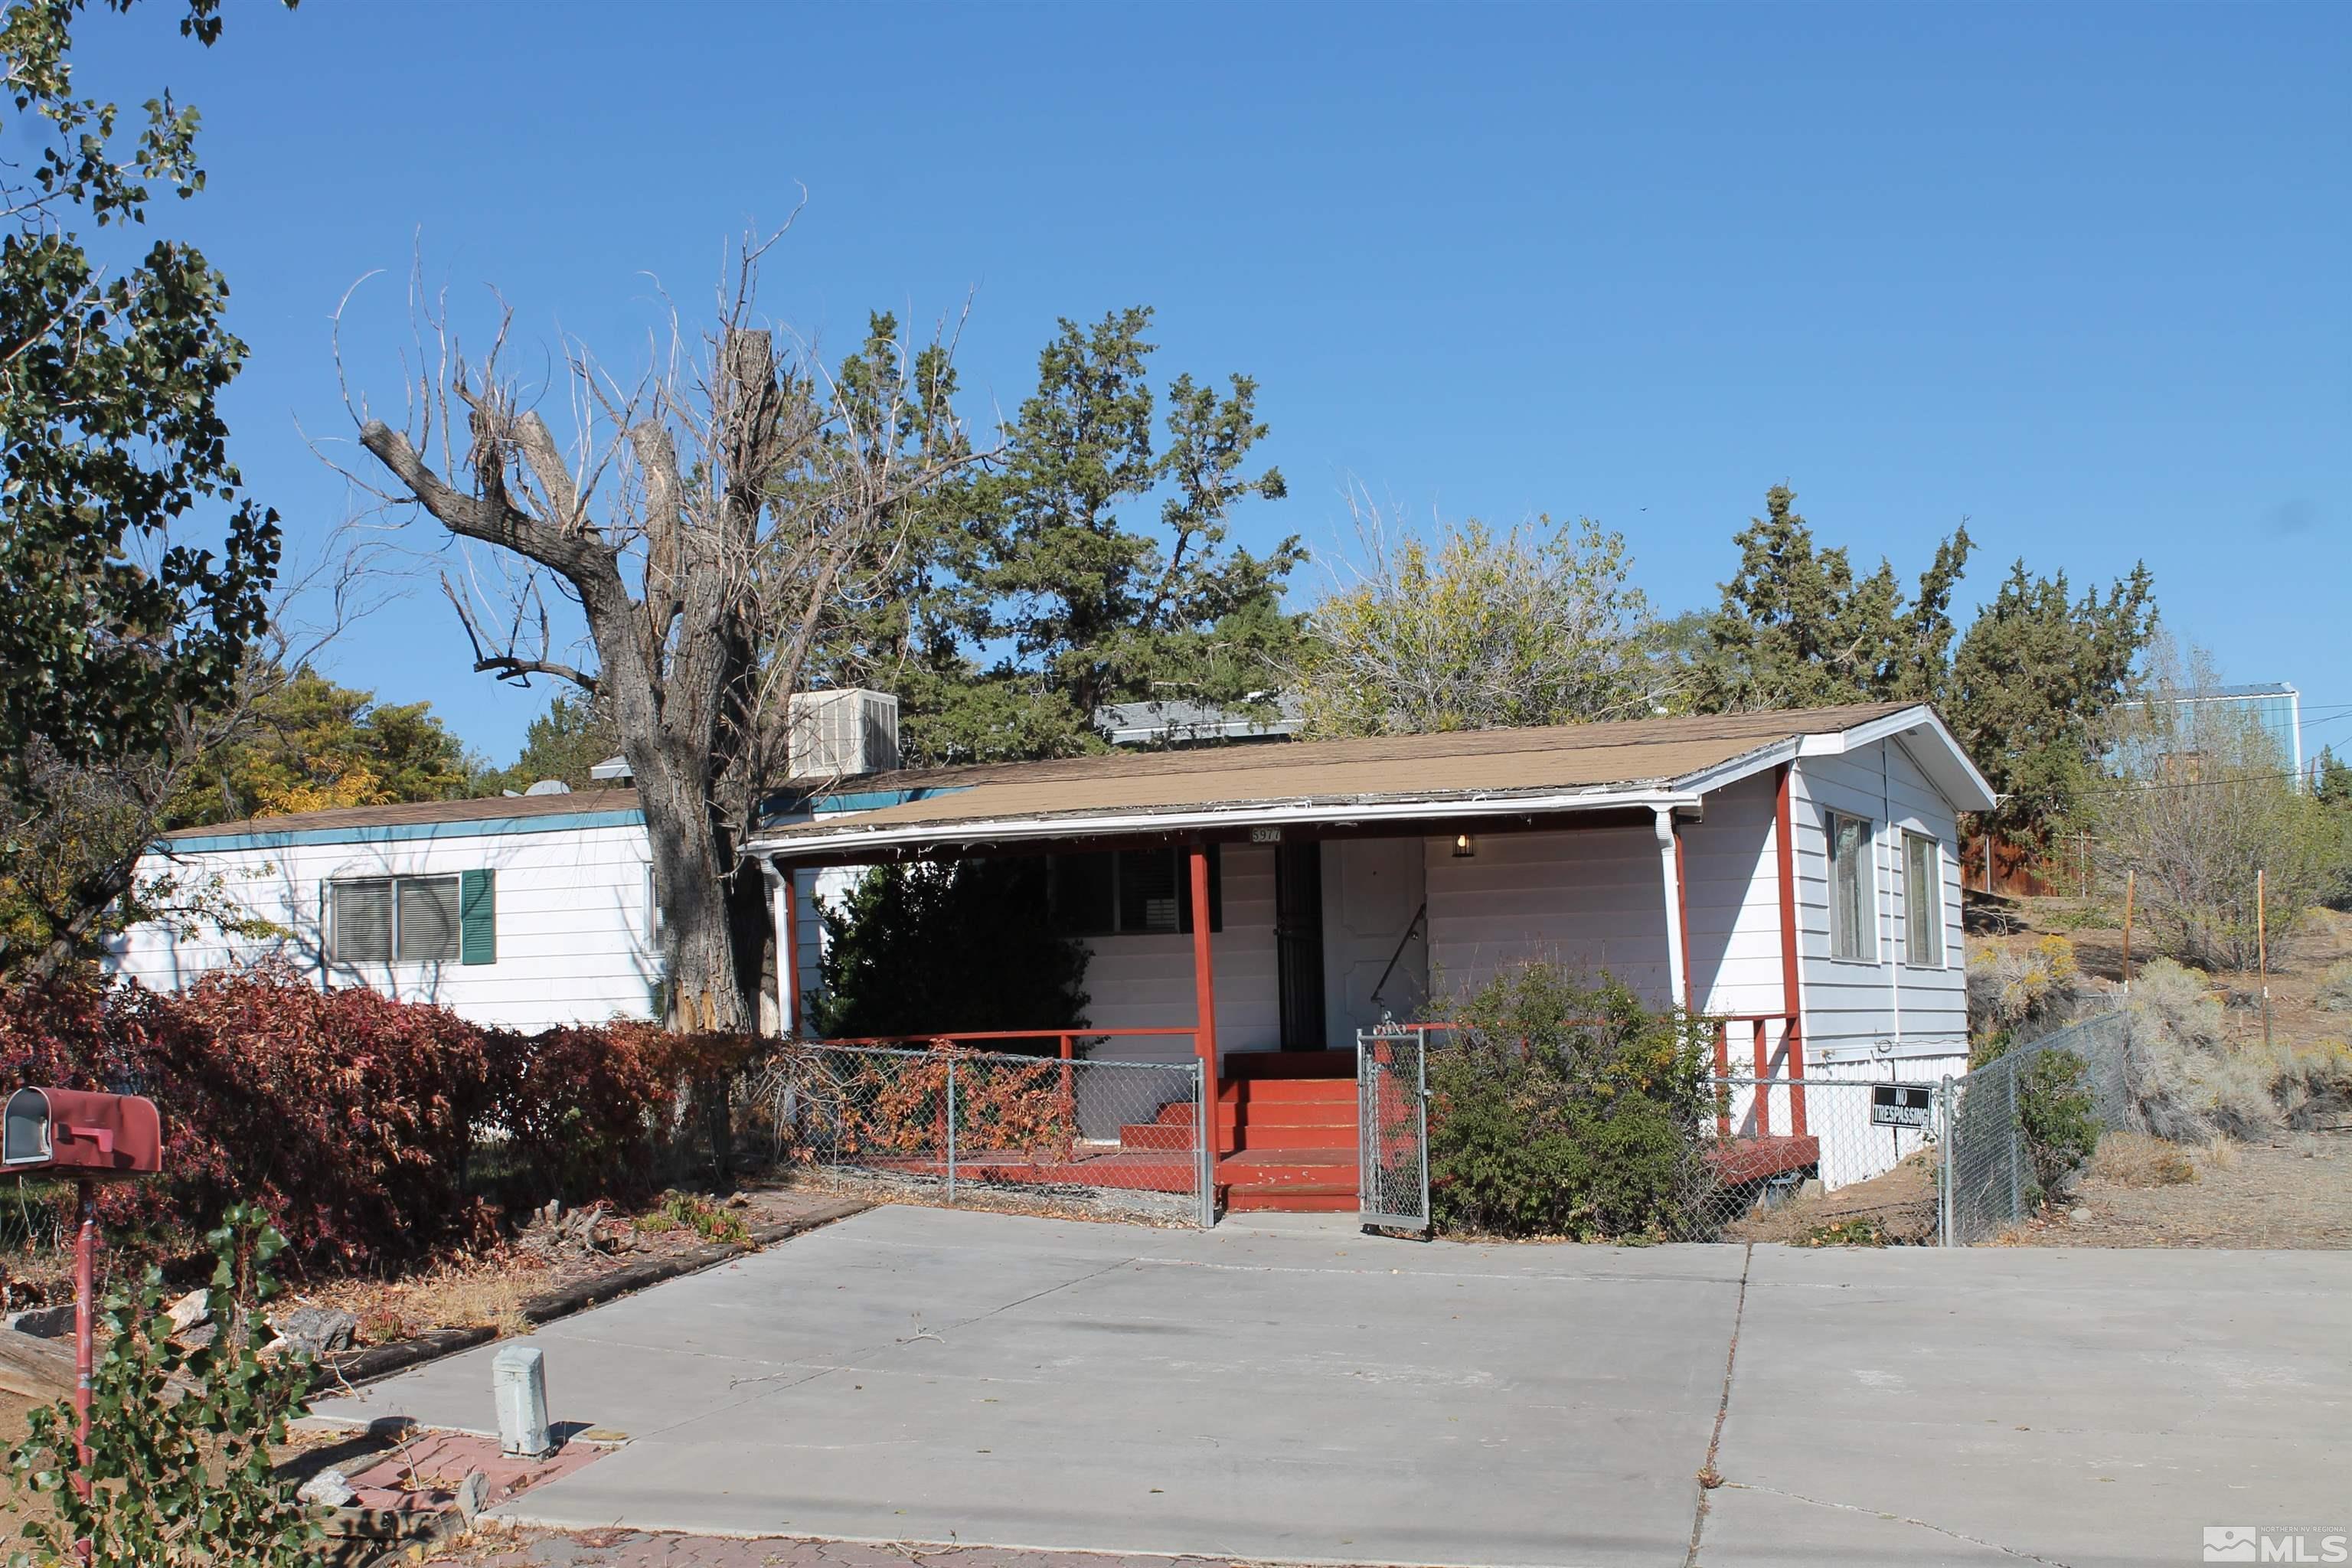 Image for 5977 Amargosa, Sun Valley, NV 89433-6701